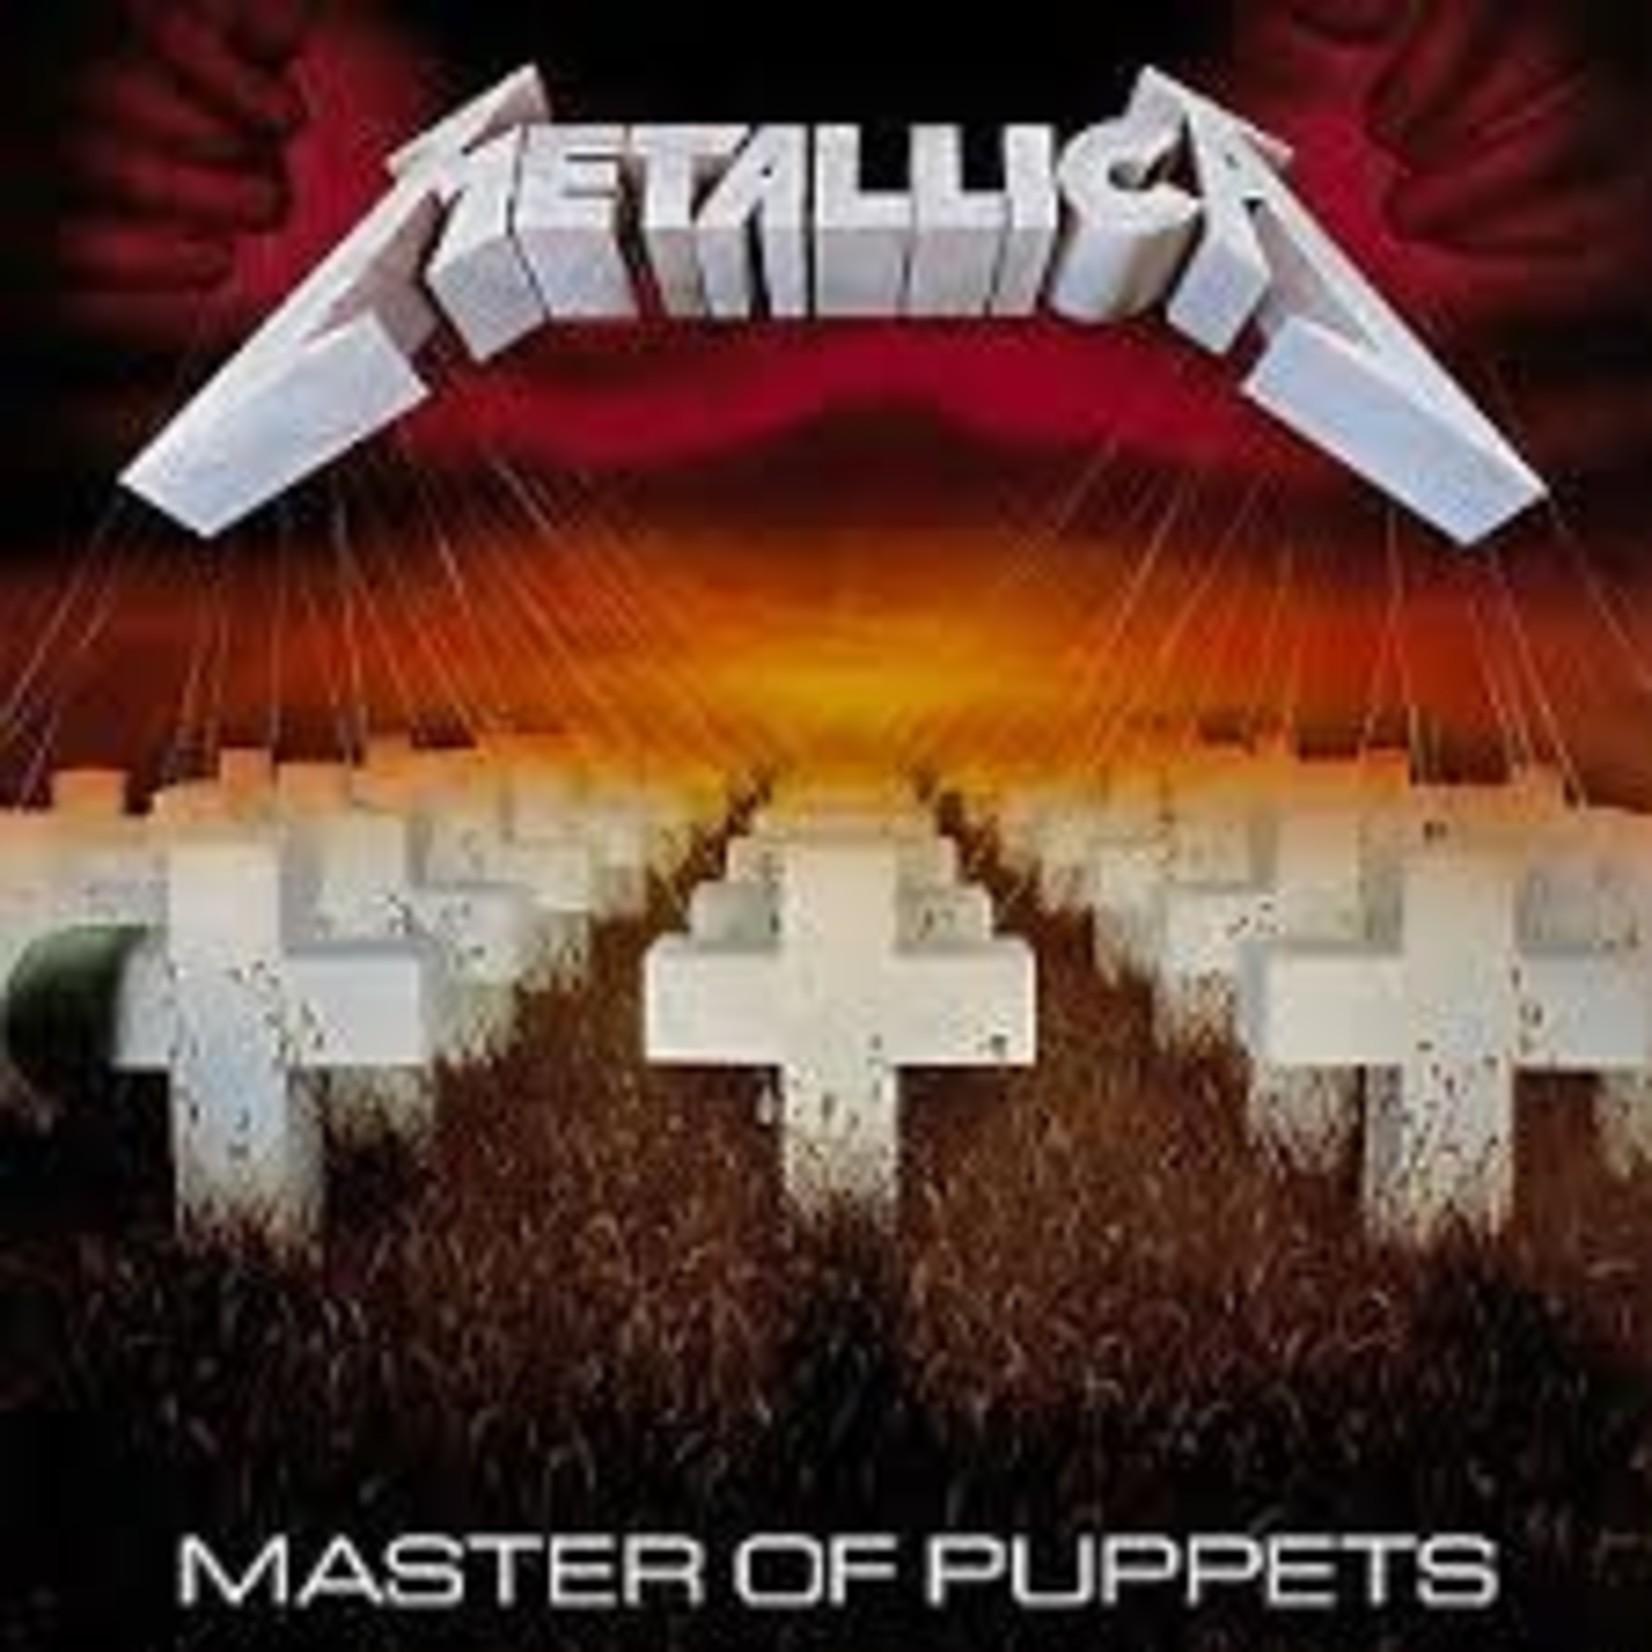 Vinyl Metallica - Master Of Puppets